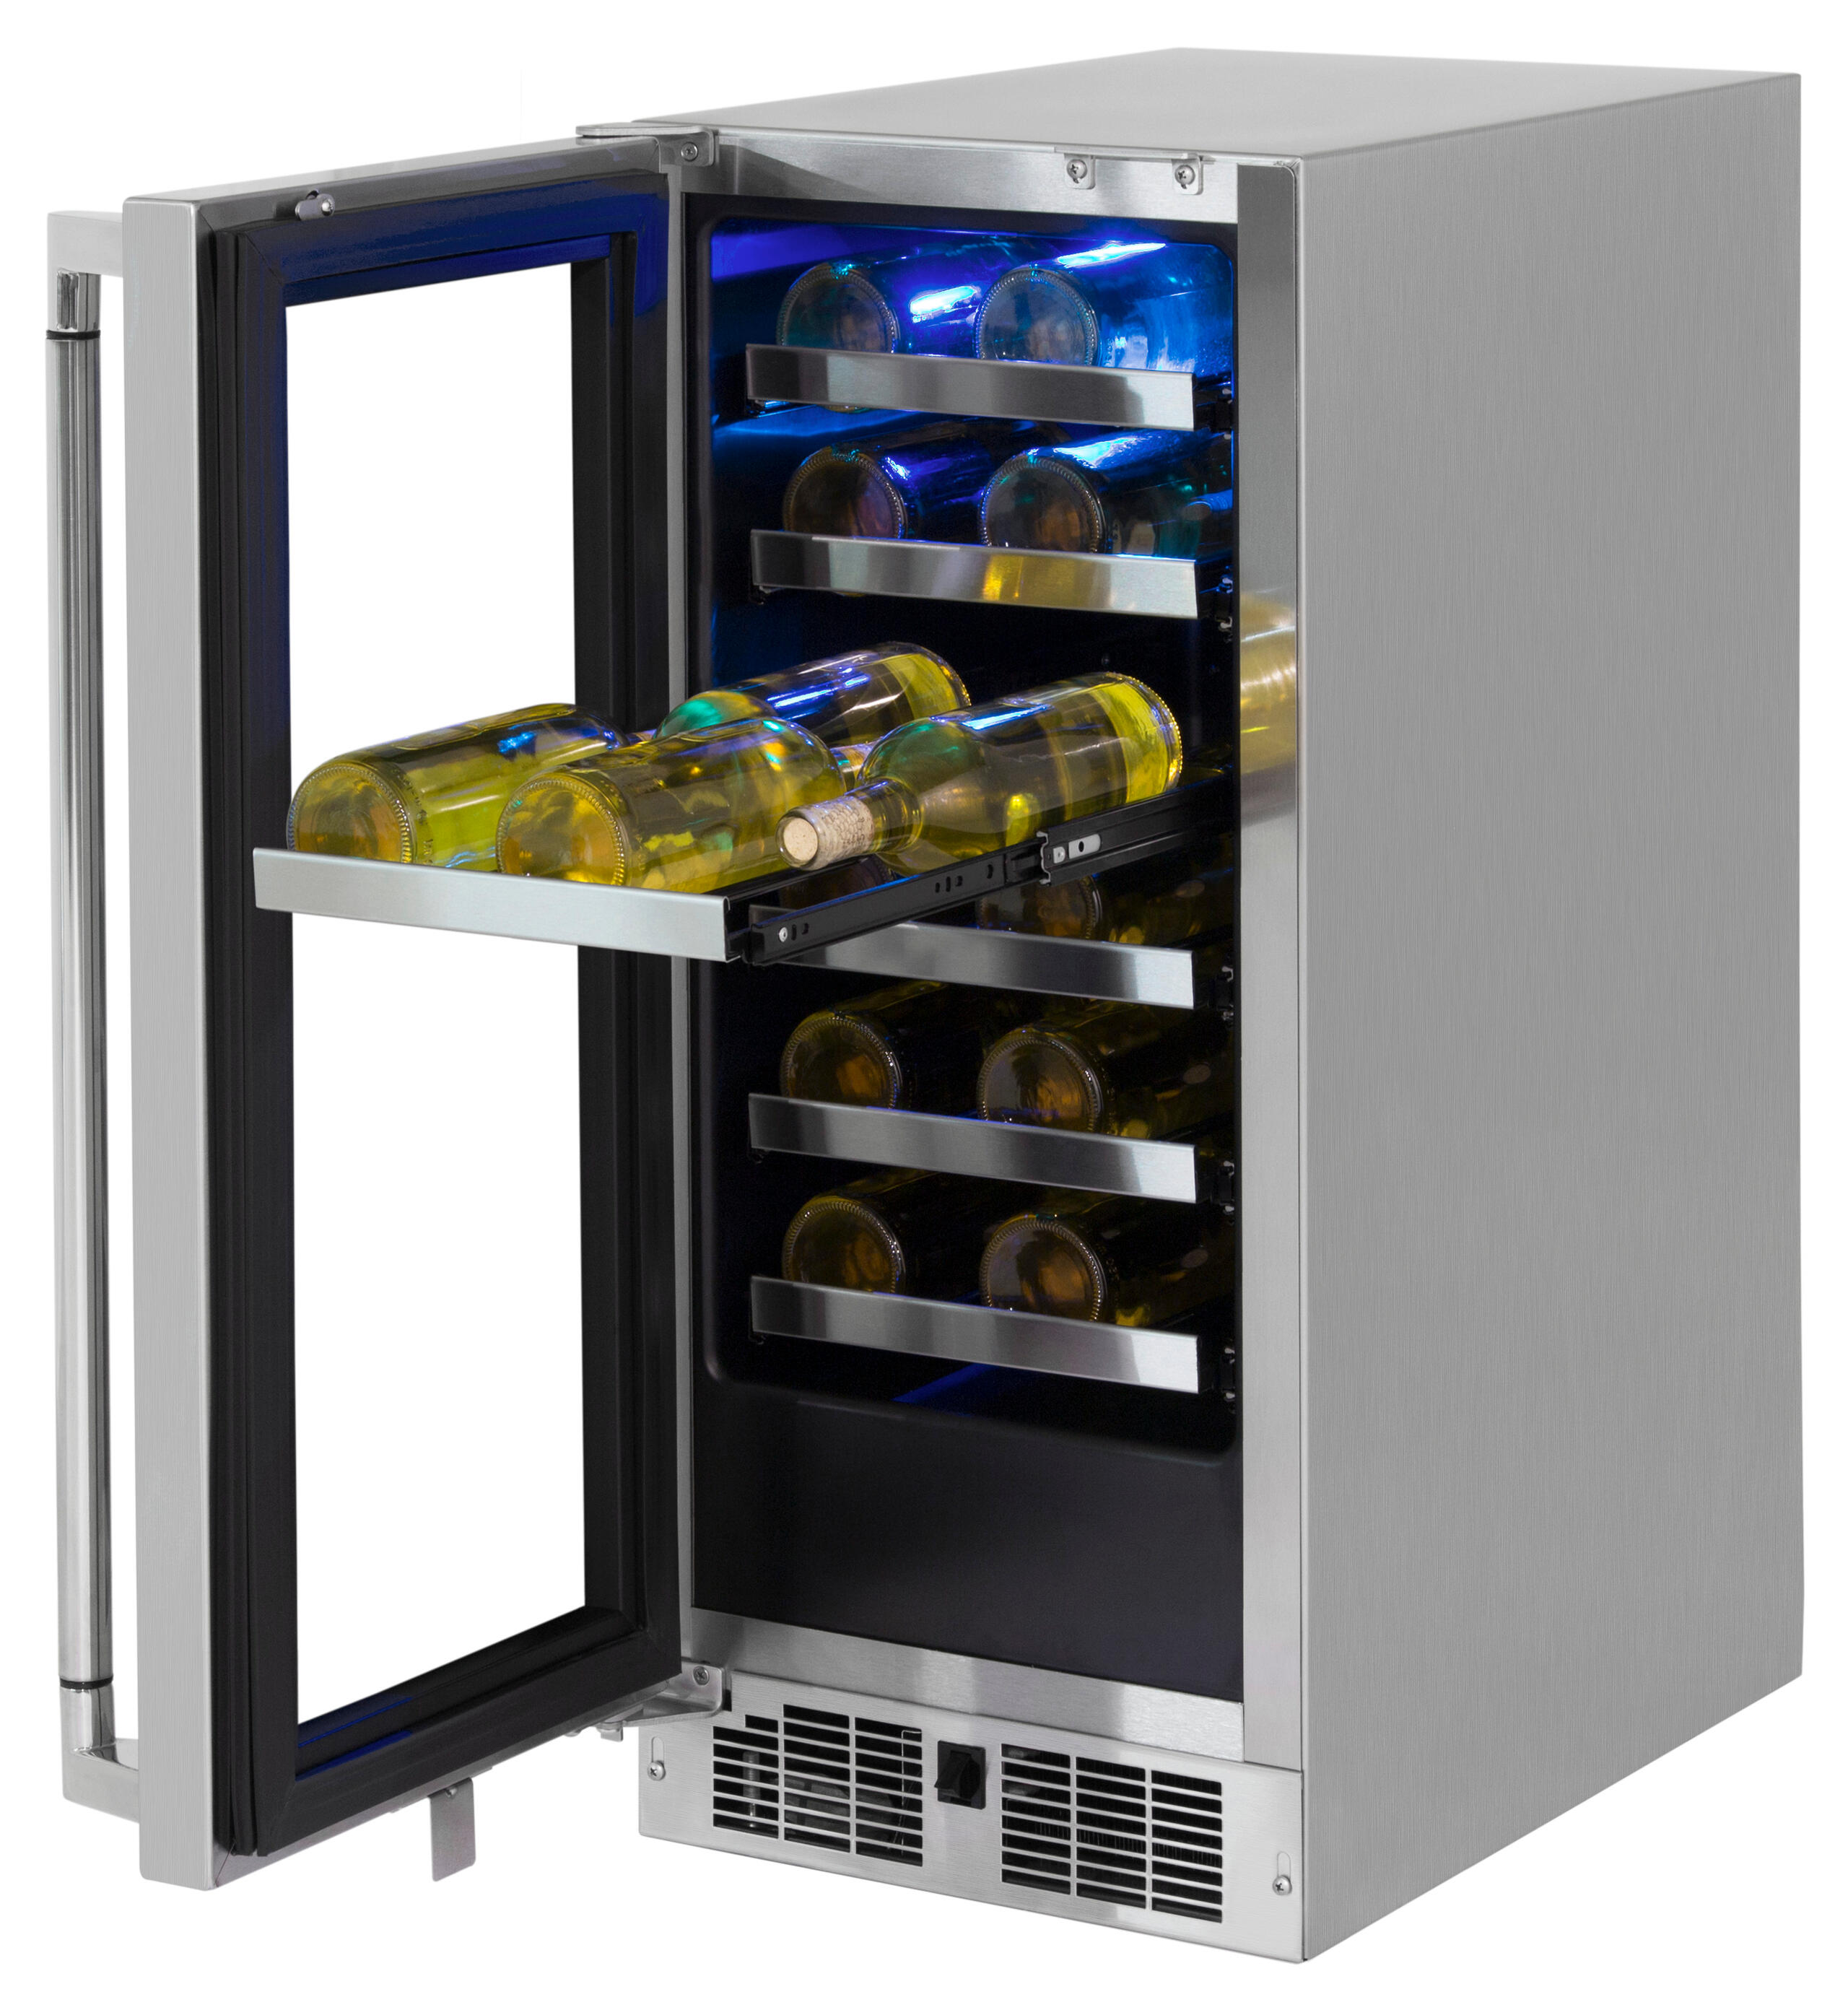 Lynx Specialty Refrigerators